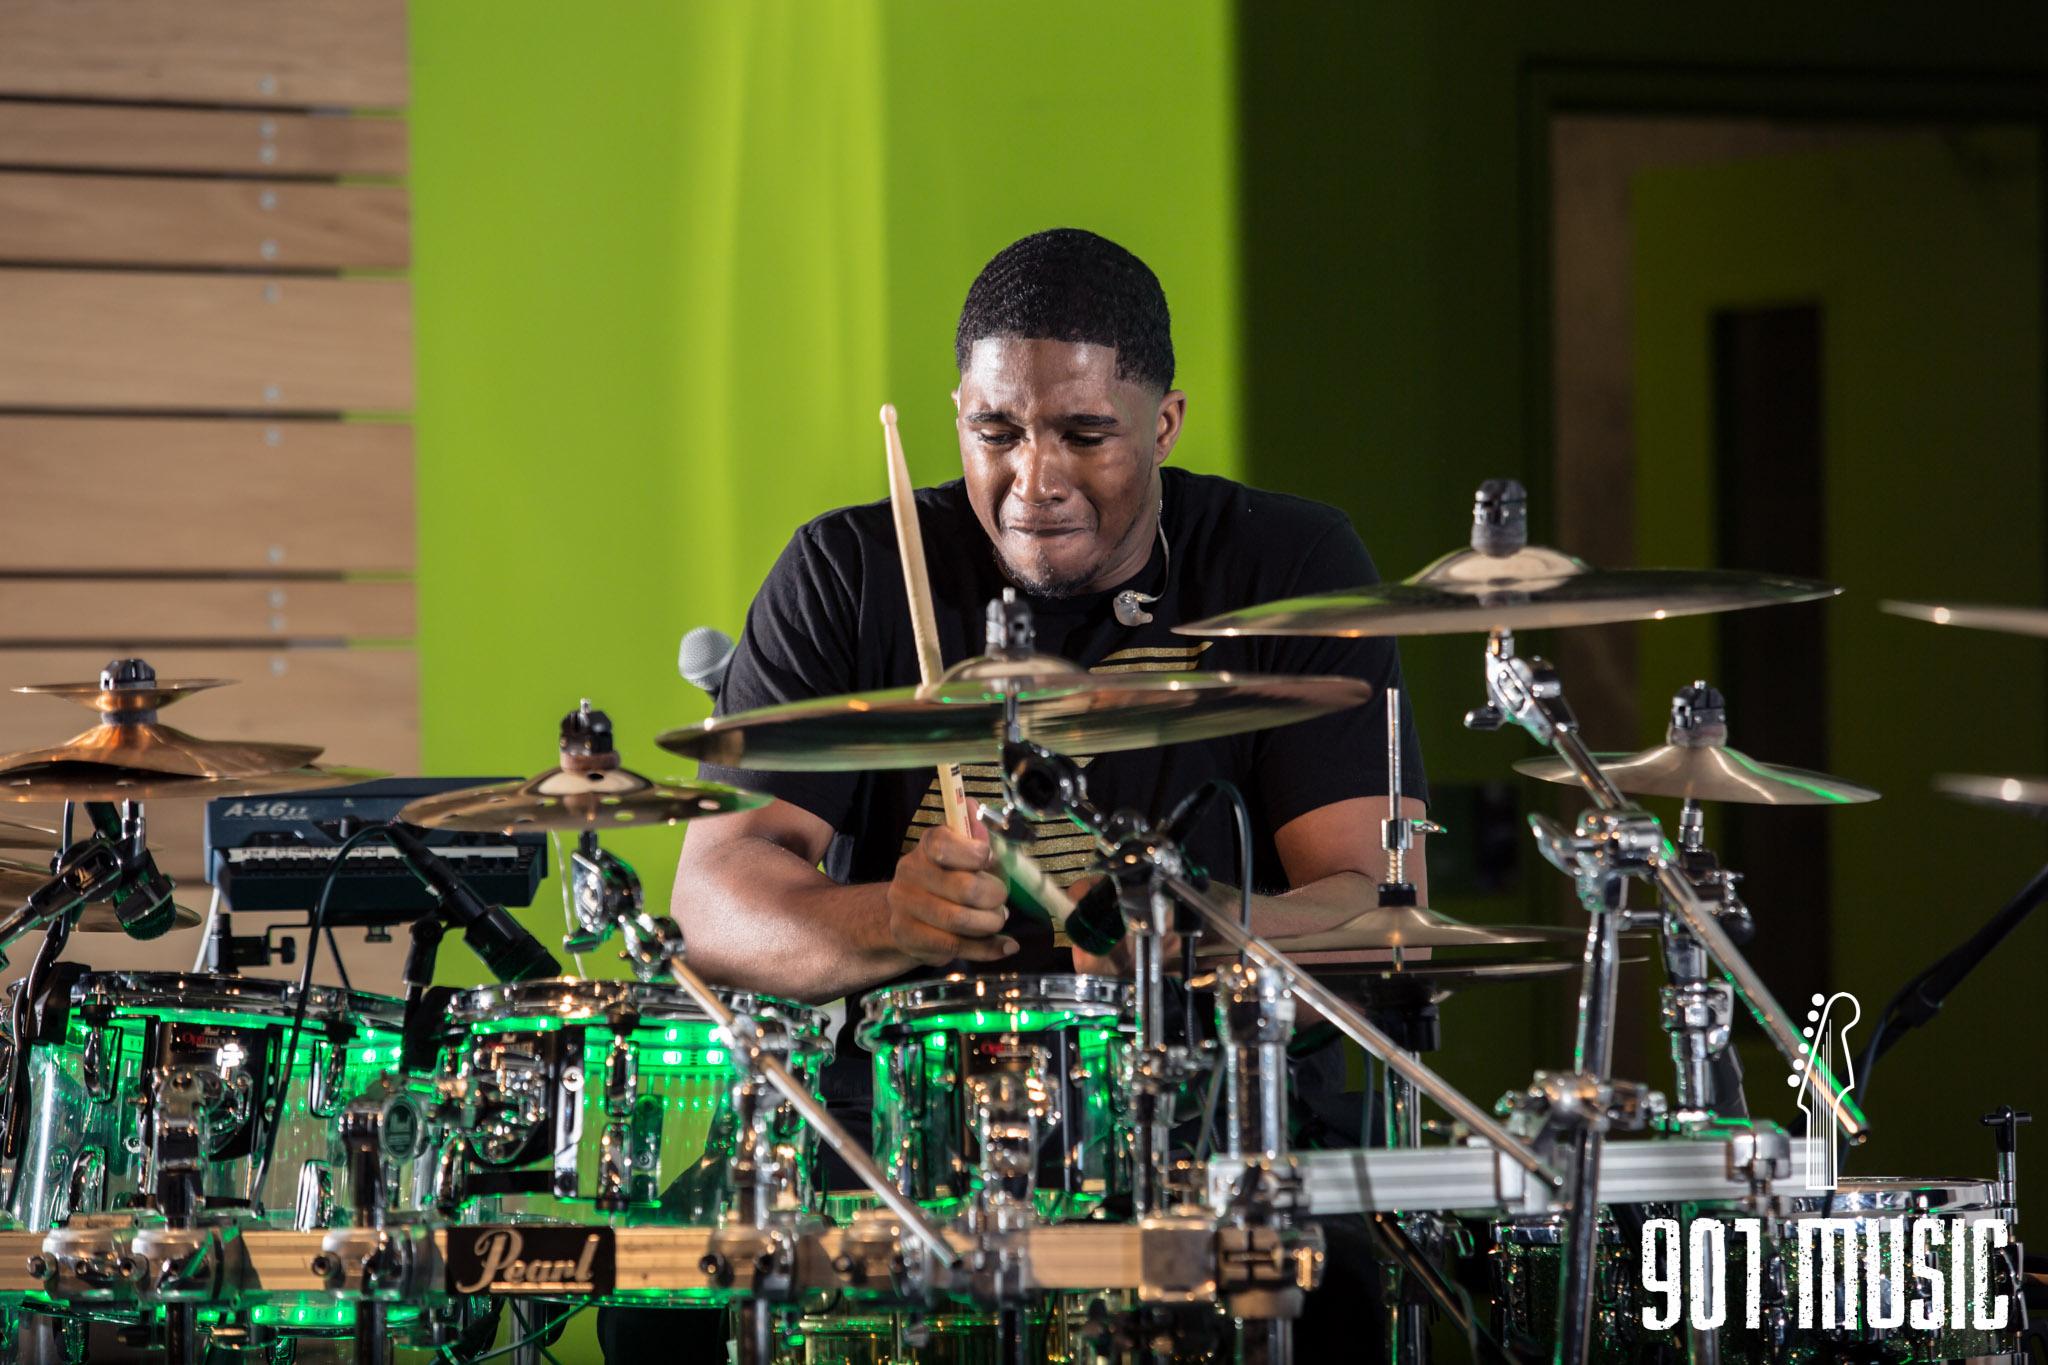 na-01222016-Visible Drum Show-31.jpg